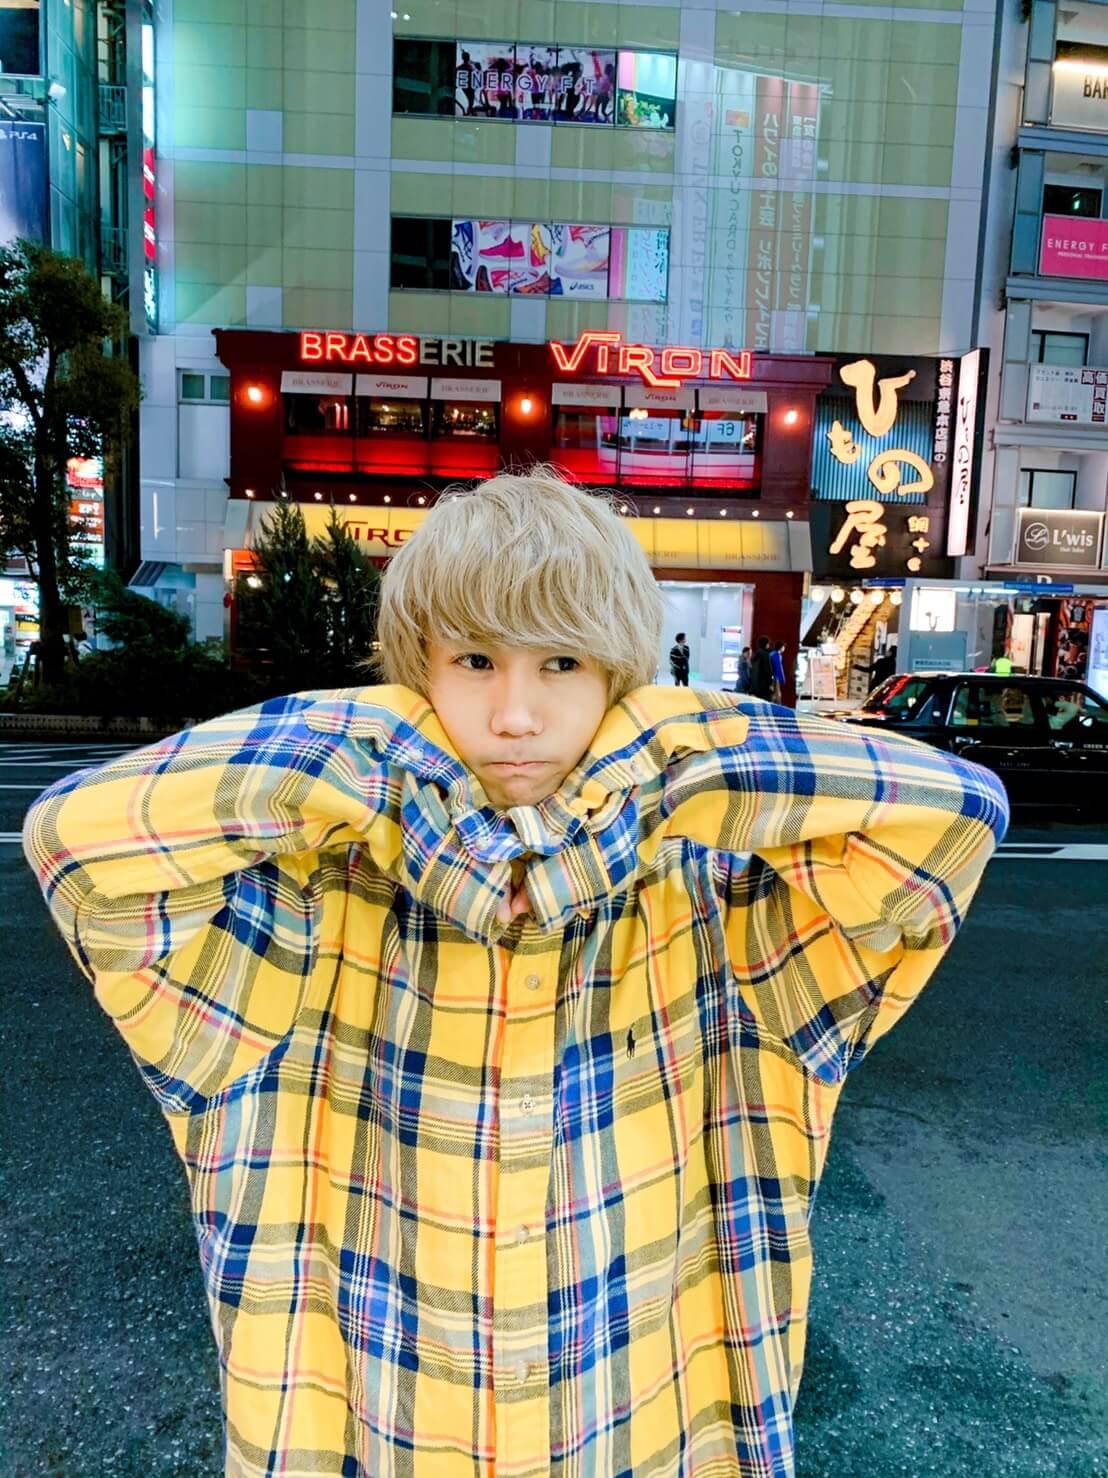 CUBERS・末吉9太郎、LINE LIVE配信にてソロ曲「顔面国宝!それなー」MV初公開決定サムネイル画像